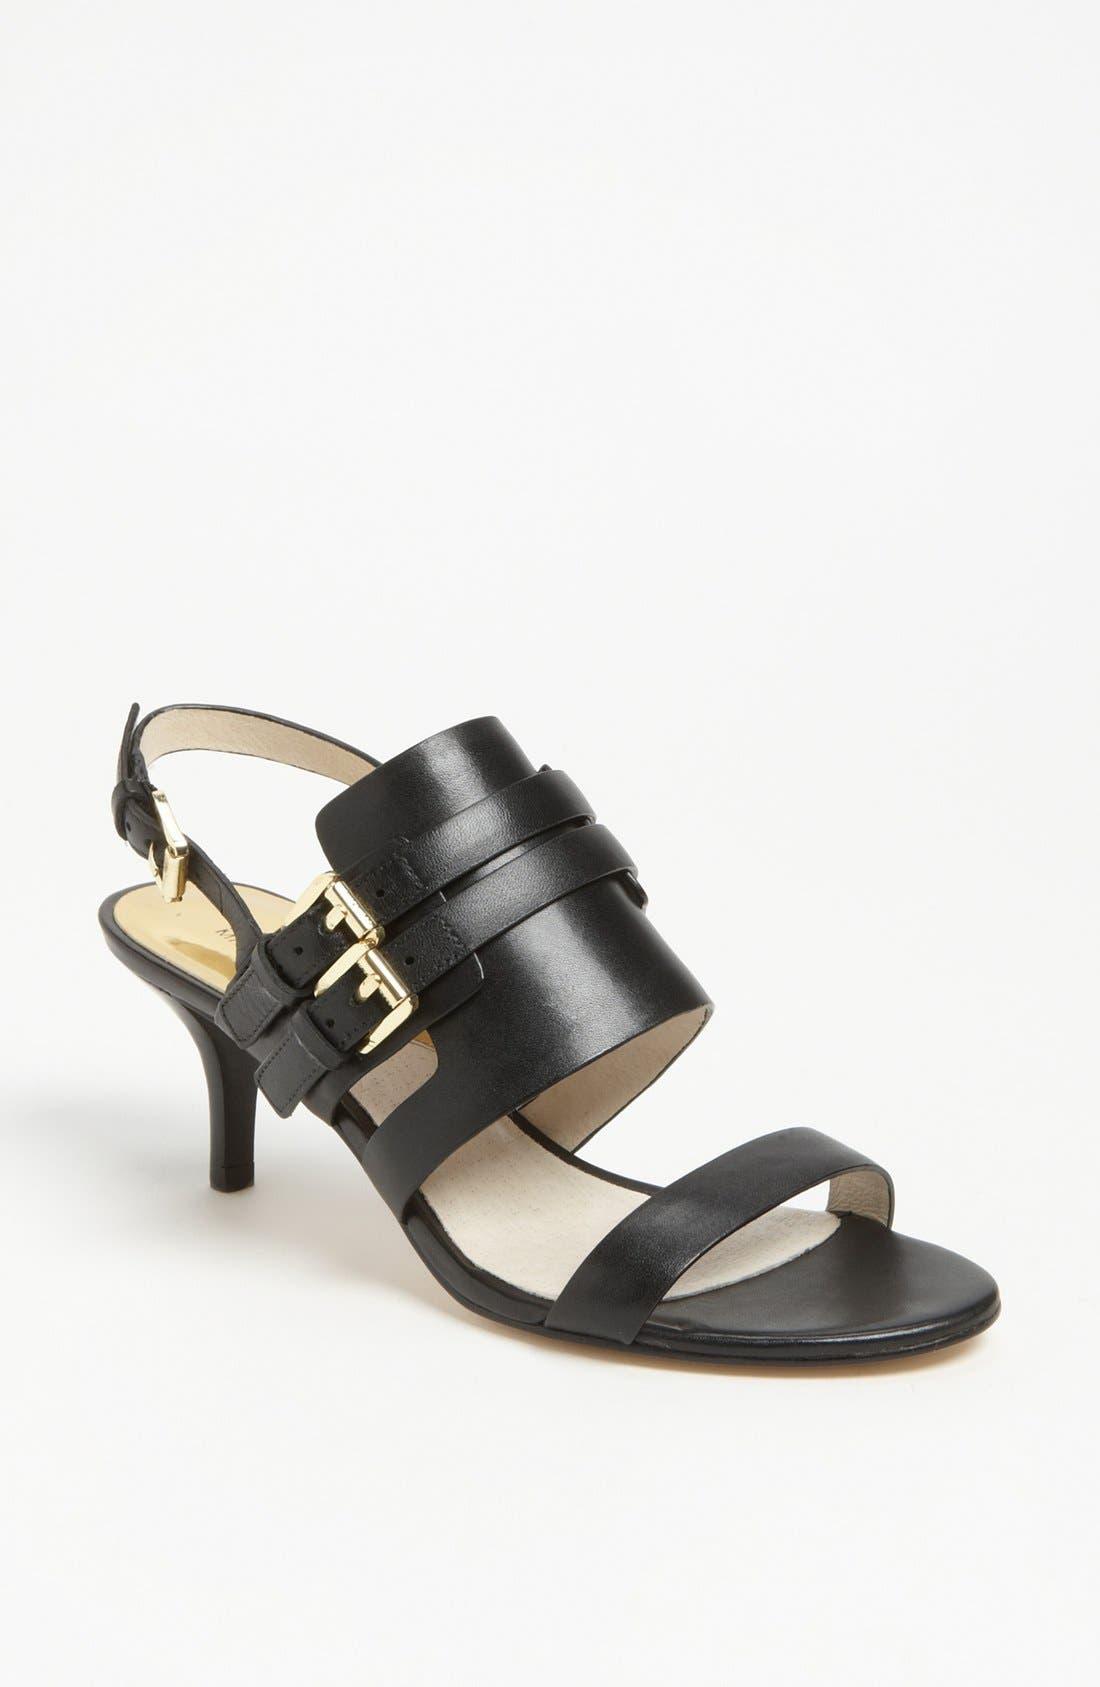 MICHAEL Michael Kors 'Melanie' Sandal